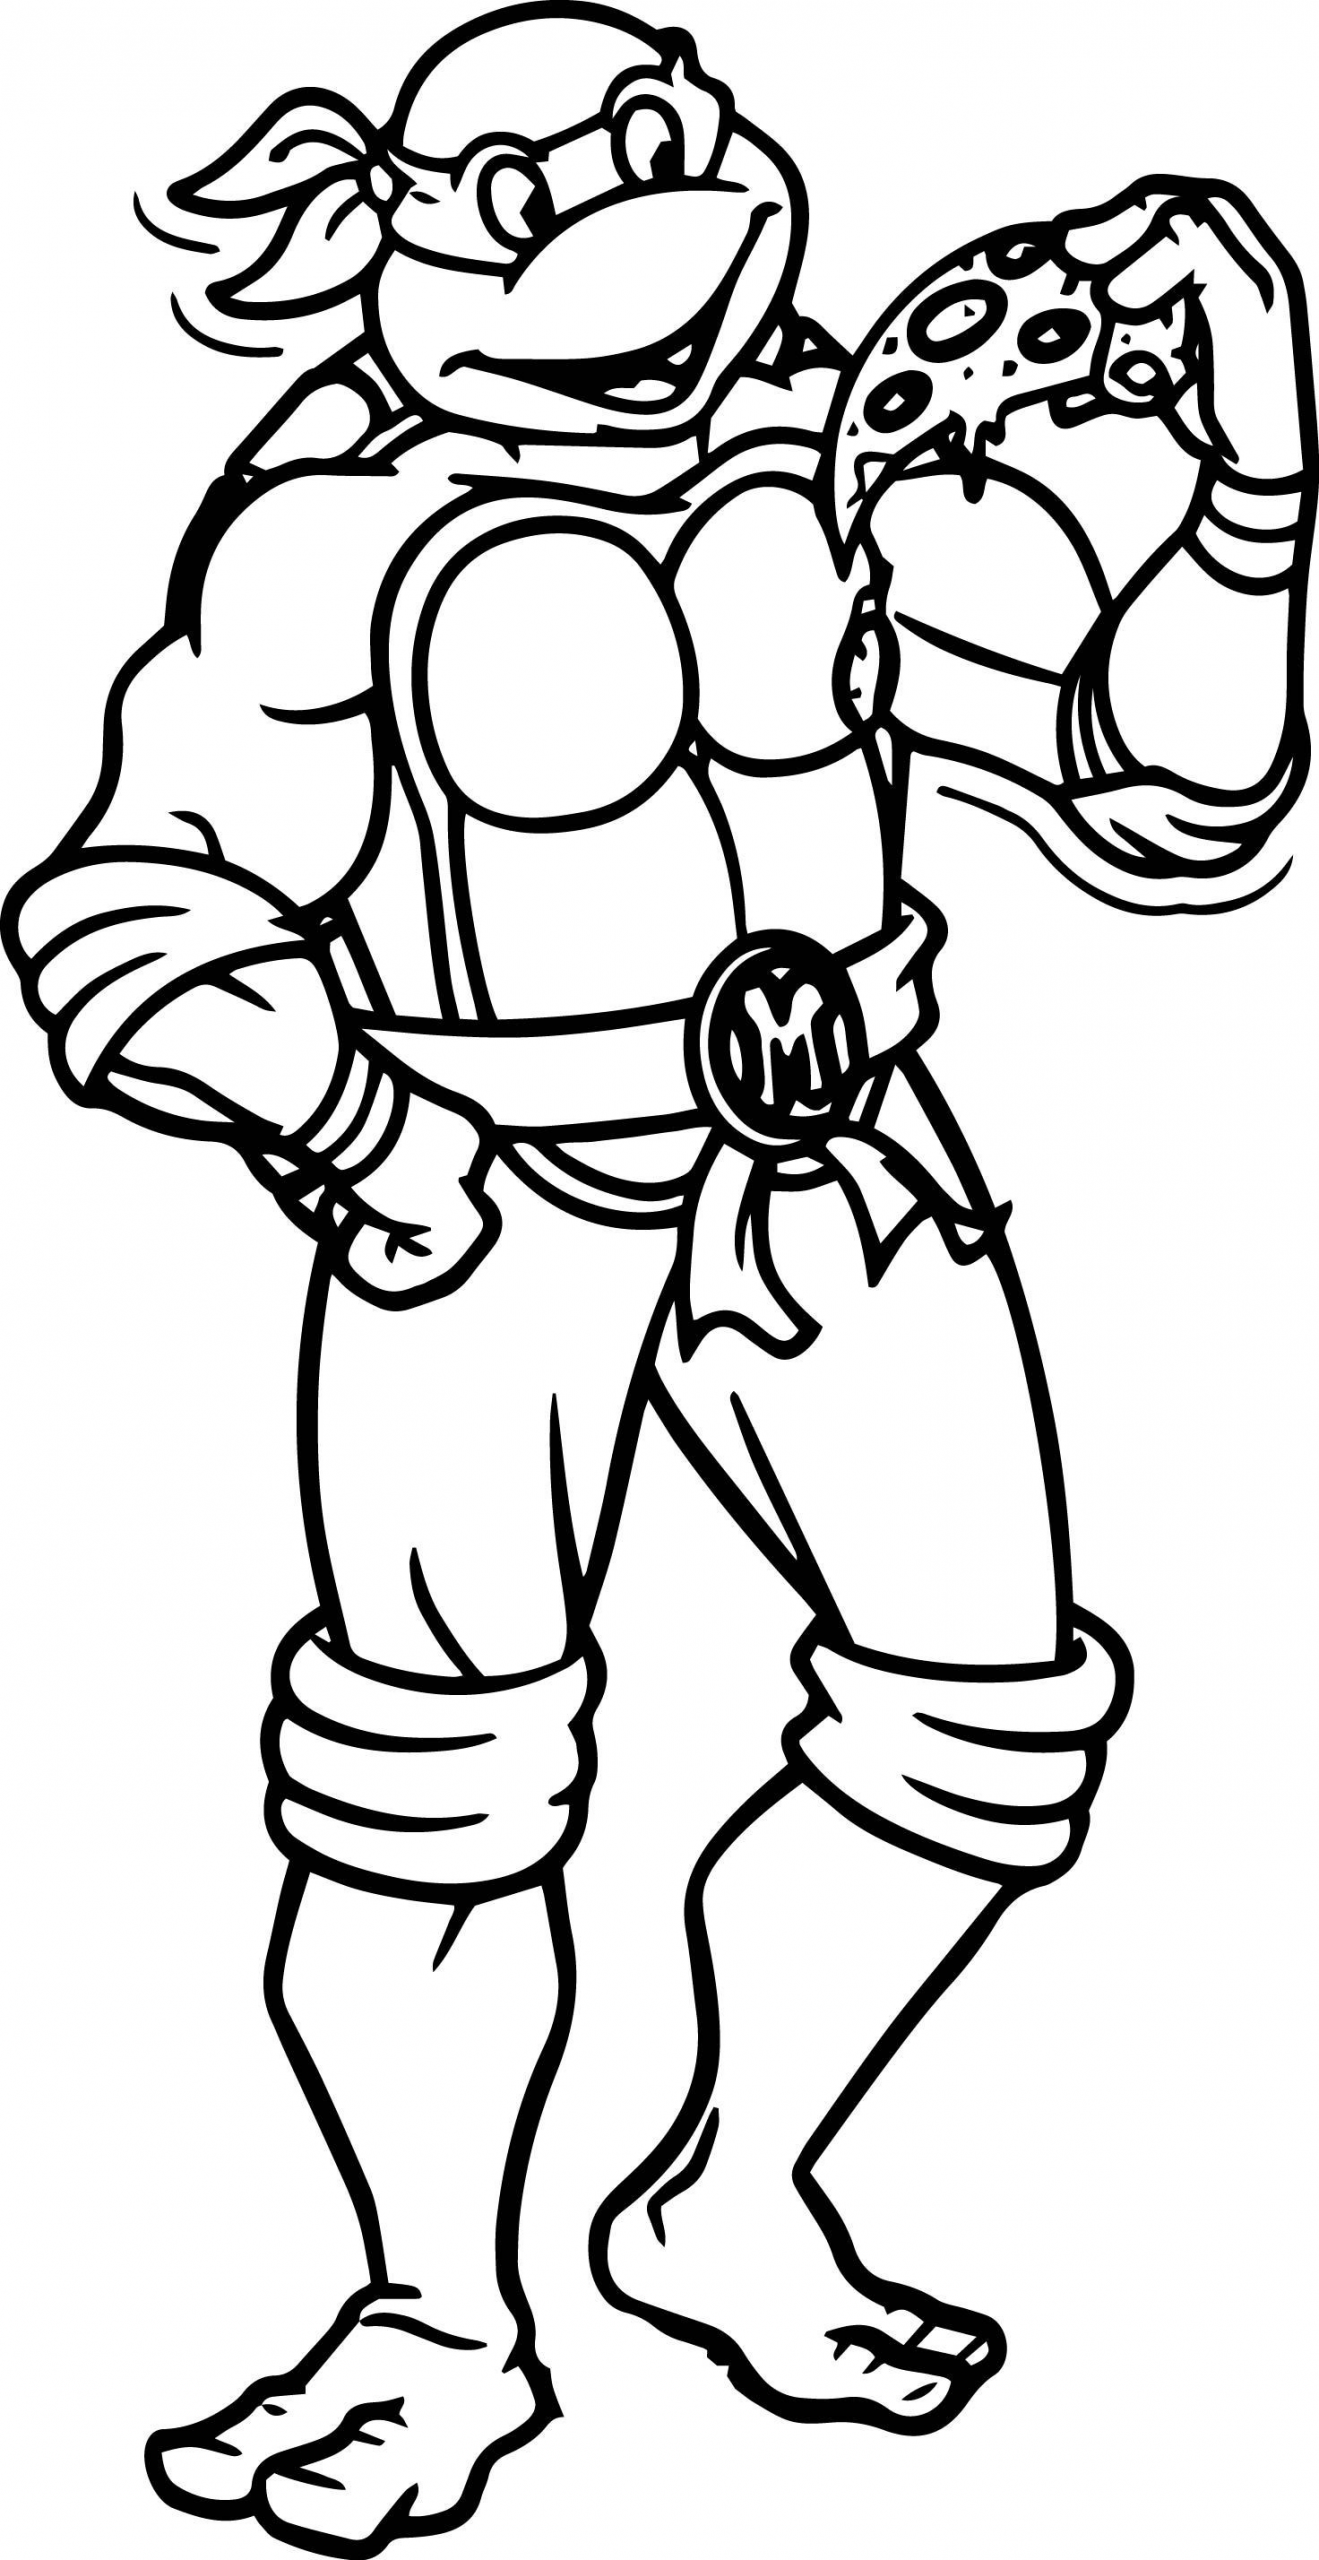 Ninja Turtle Coloring Page Turtle Coloring Pages Cartoon Coloring Pages Ninja Turtle Coloring Pages